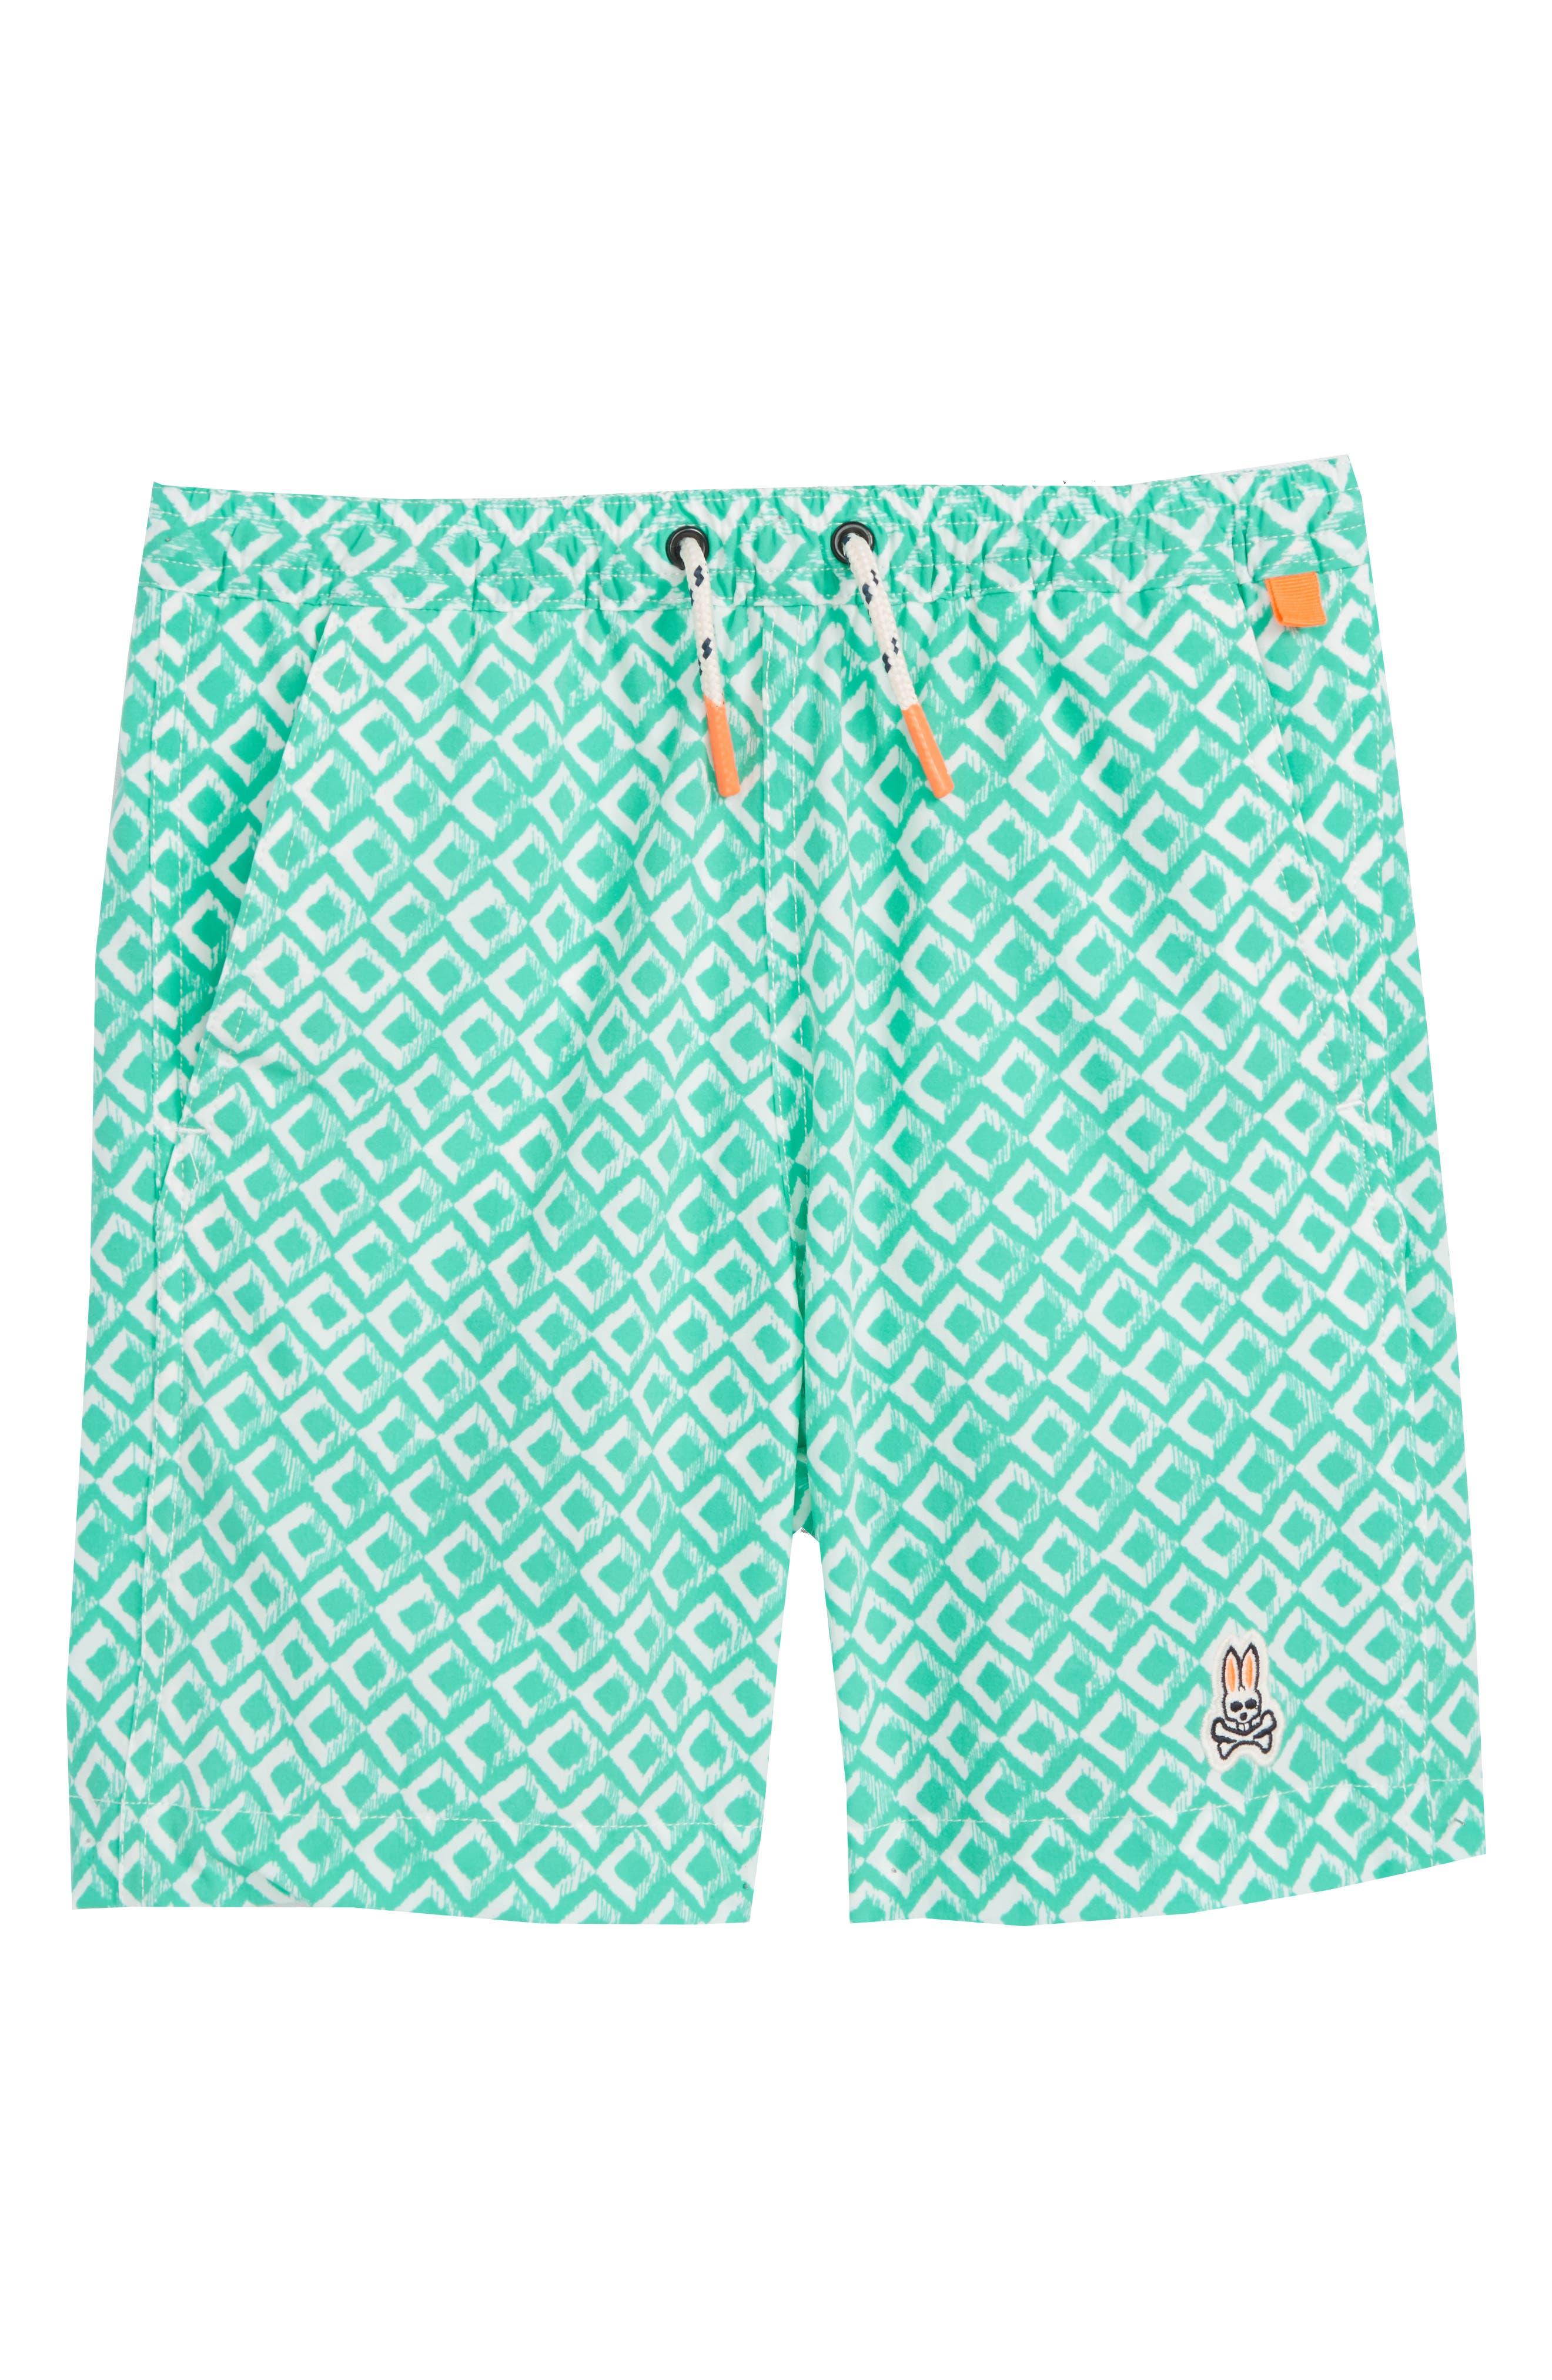 Drippy Diamond Swim Trunks,                         Main,                         color, Wave